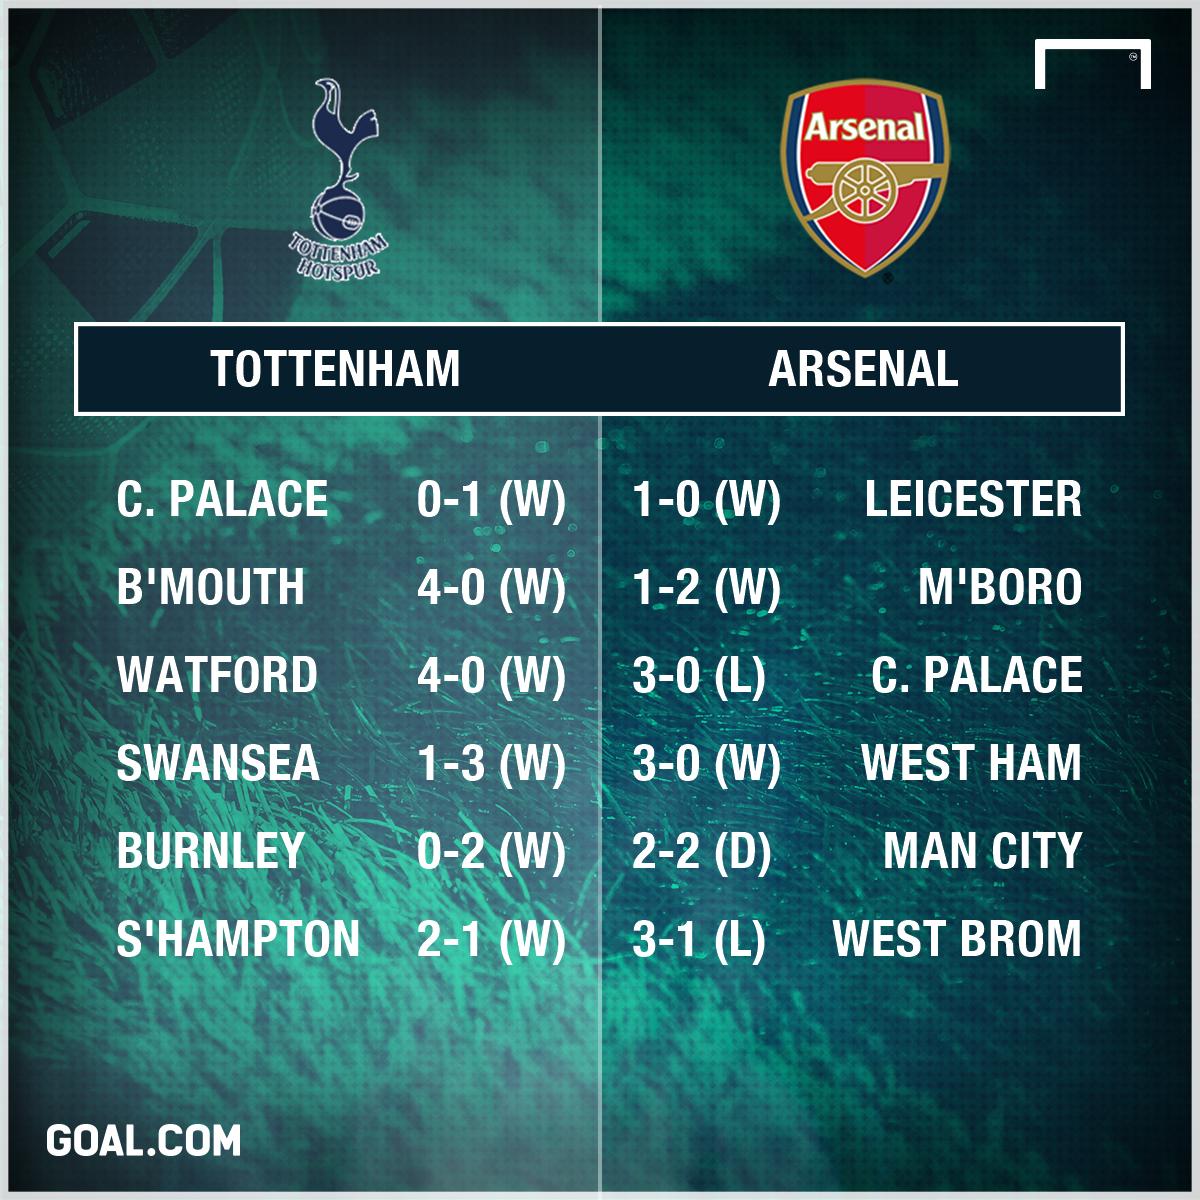 GFX Tottenham Arsenal